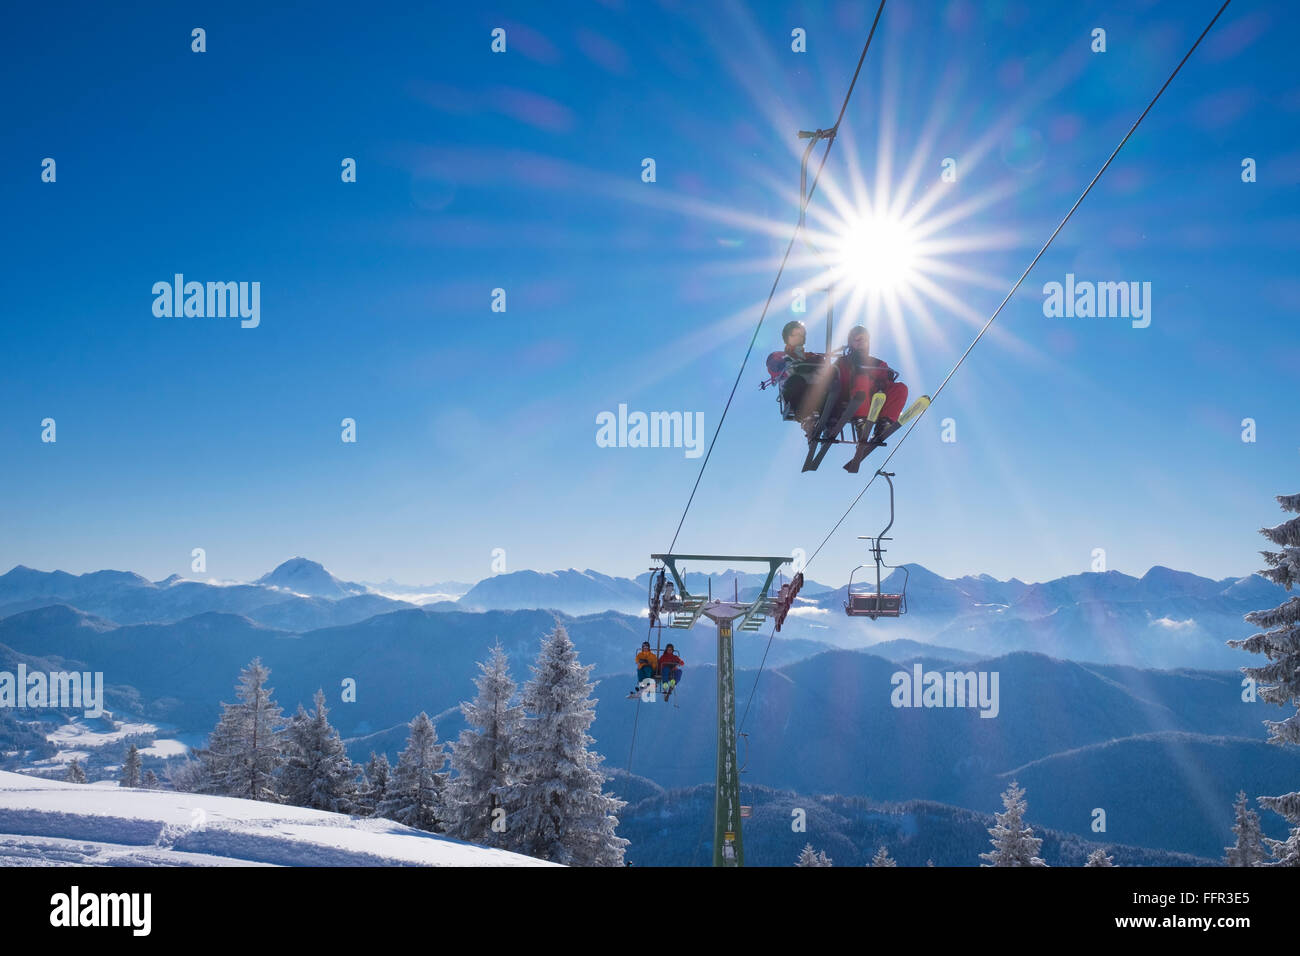 Telesilla Finstermünz, ski resort Brauneck, Lenggries, Isarwinkel Prealps, Baviera, Alta Baviera, Baviera, Alemania Foto de stock